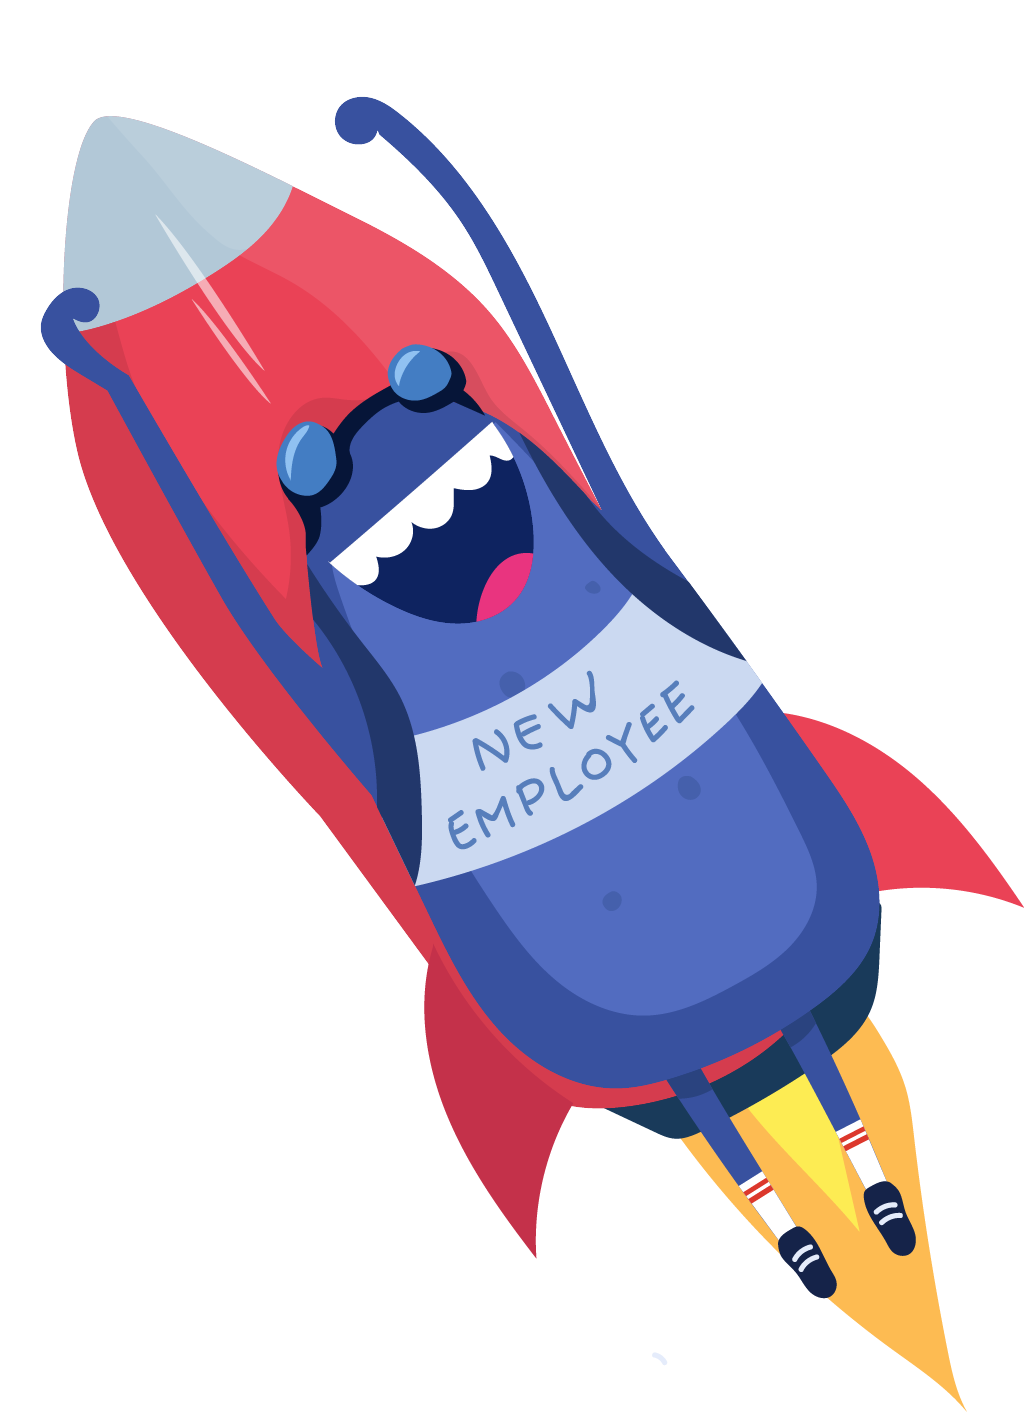 Bertie rocket wearing new employee sign